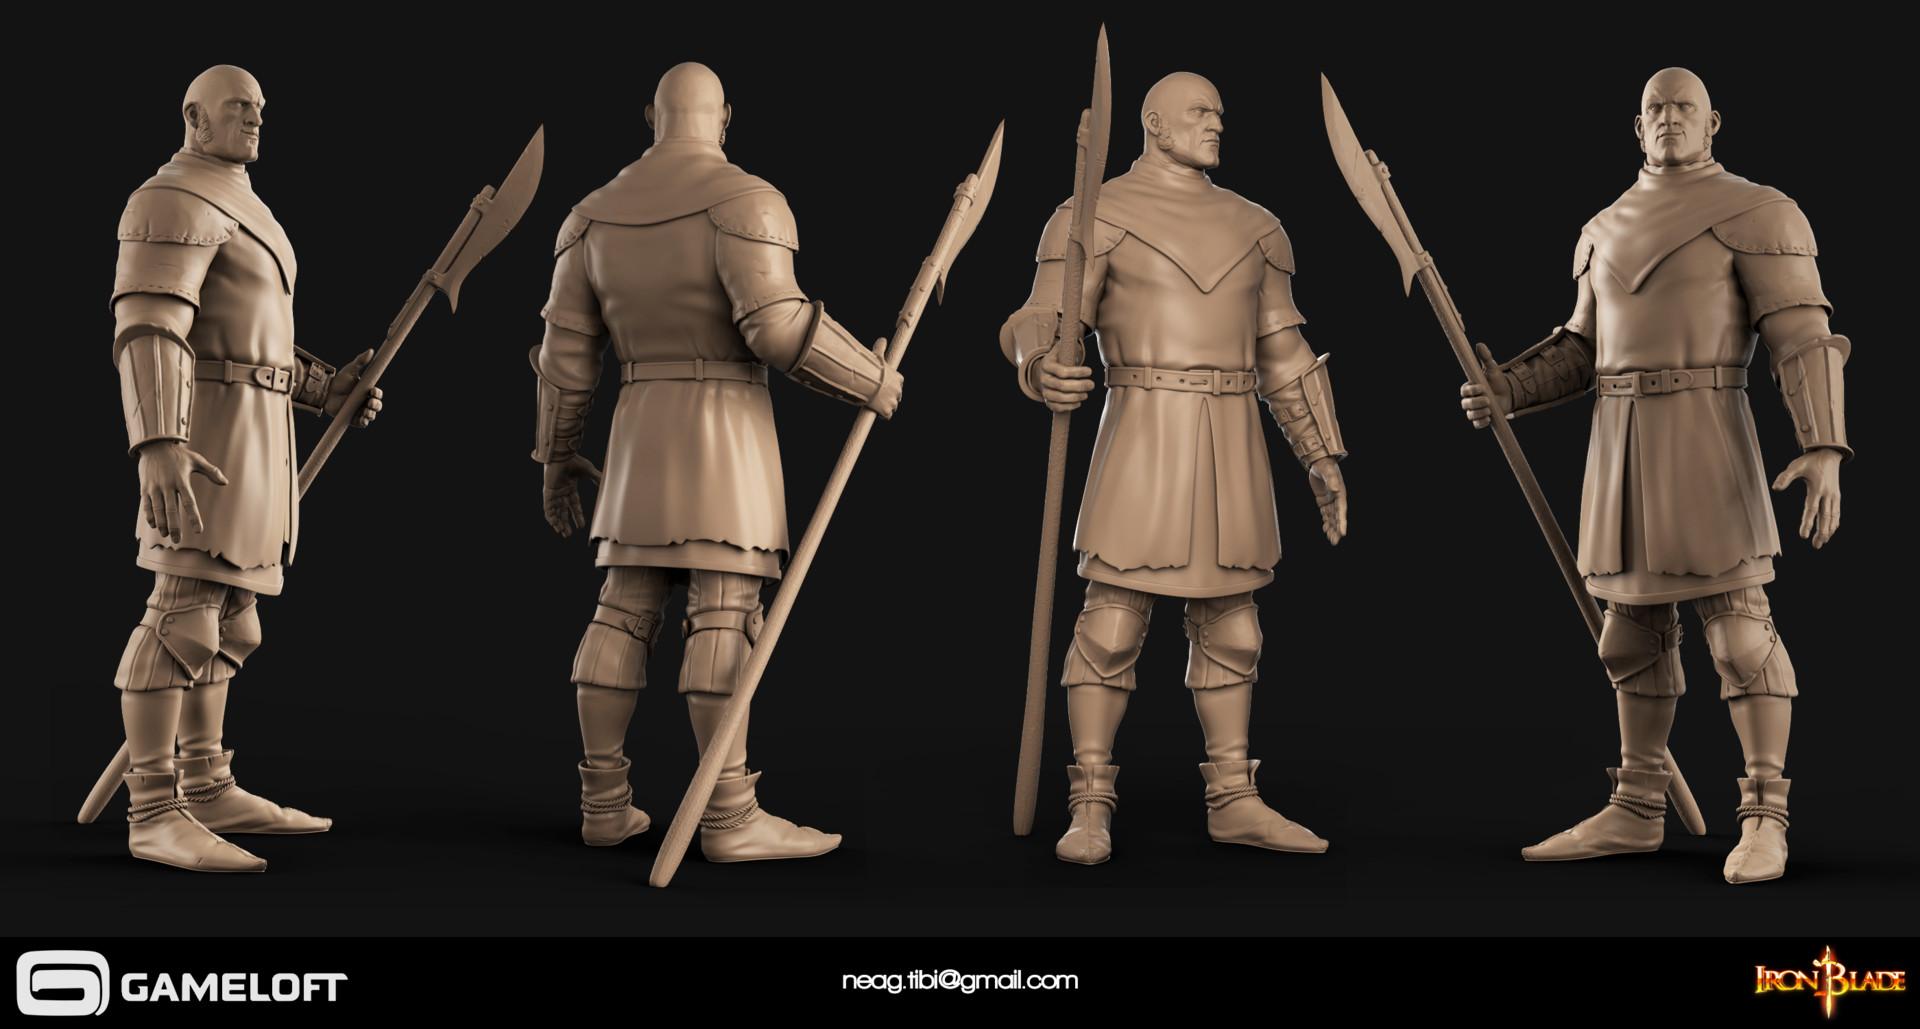 Tibi neag tibi neag iron blade garrison soldier a high poly